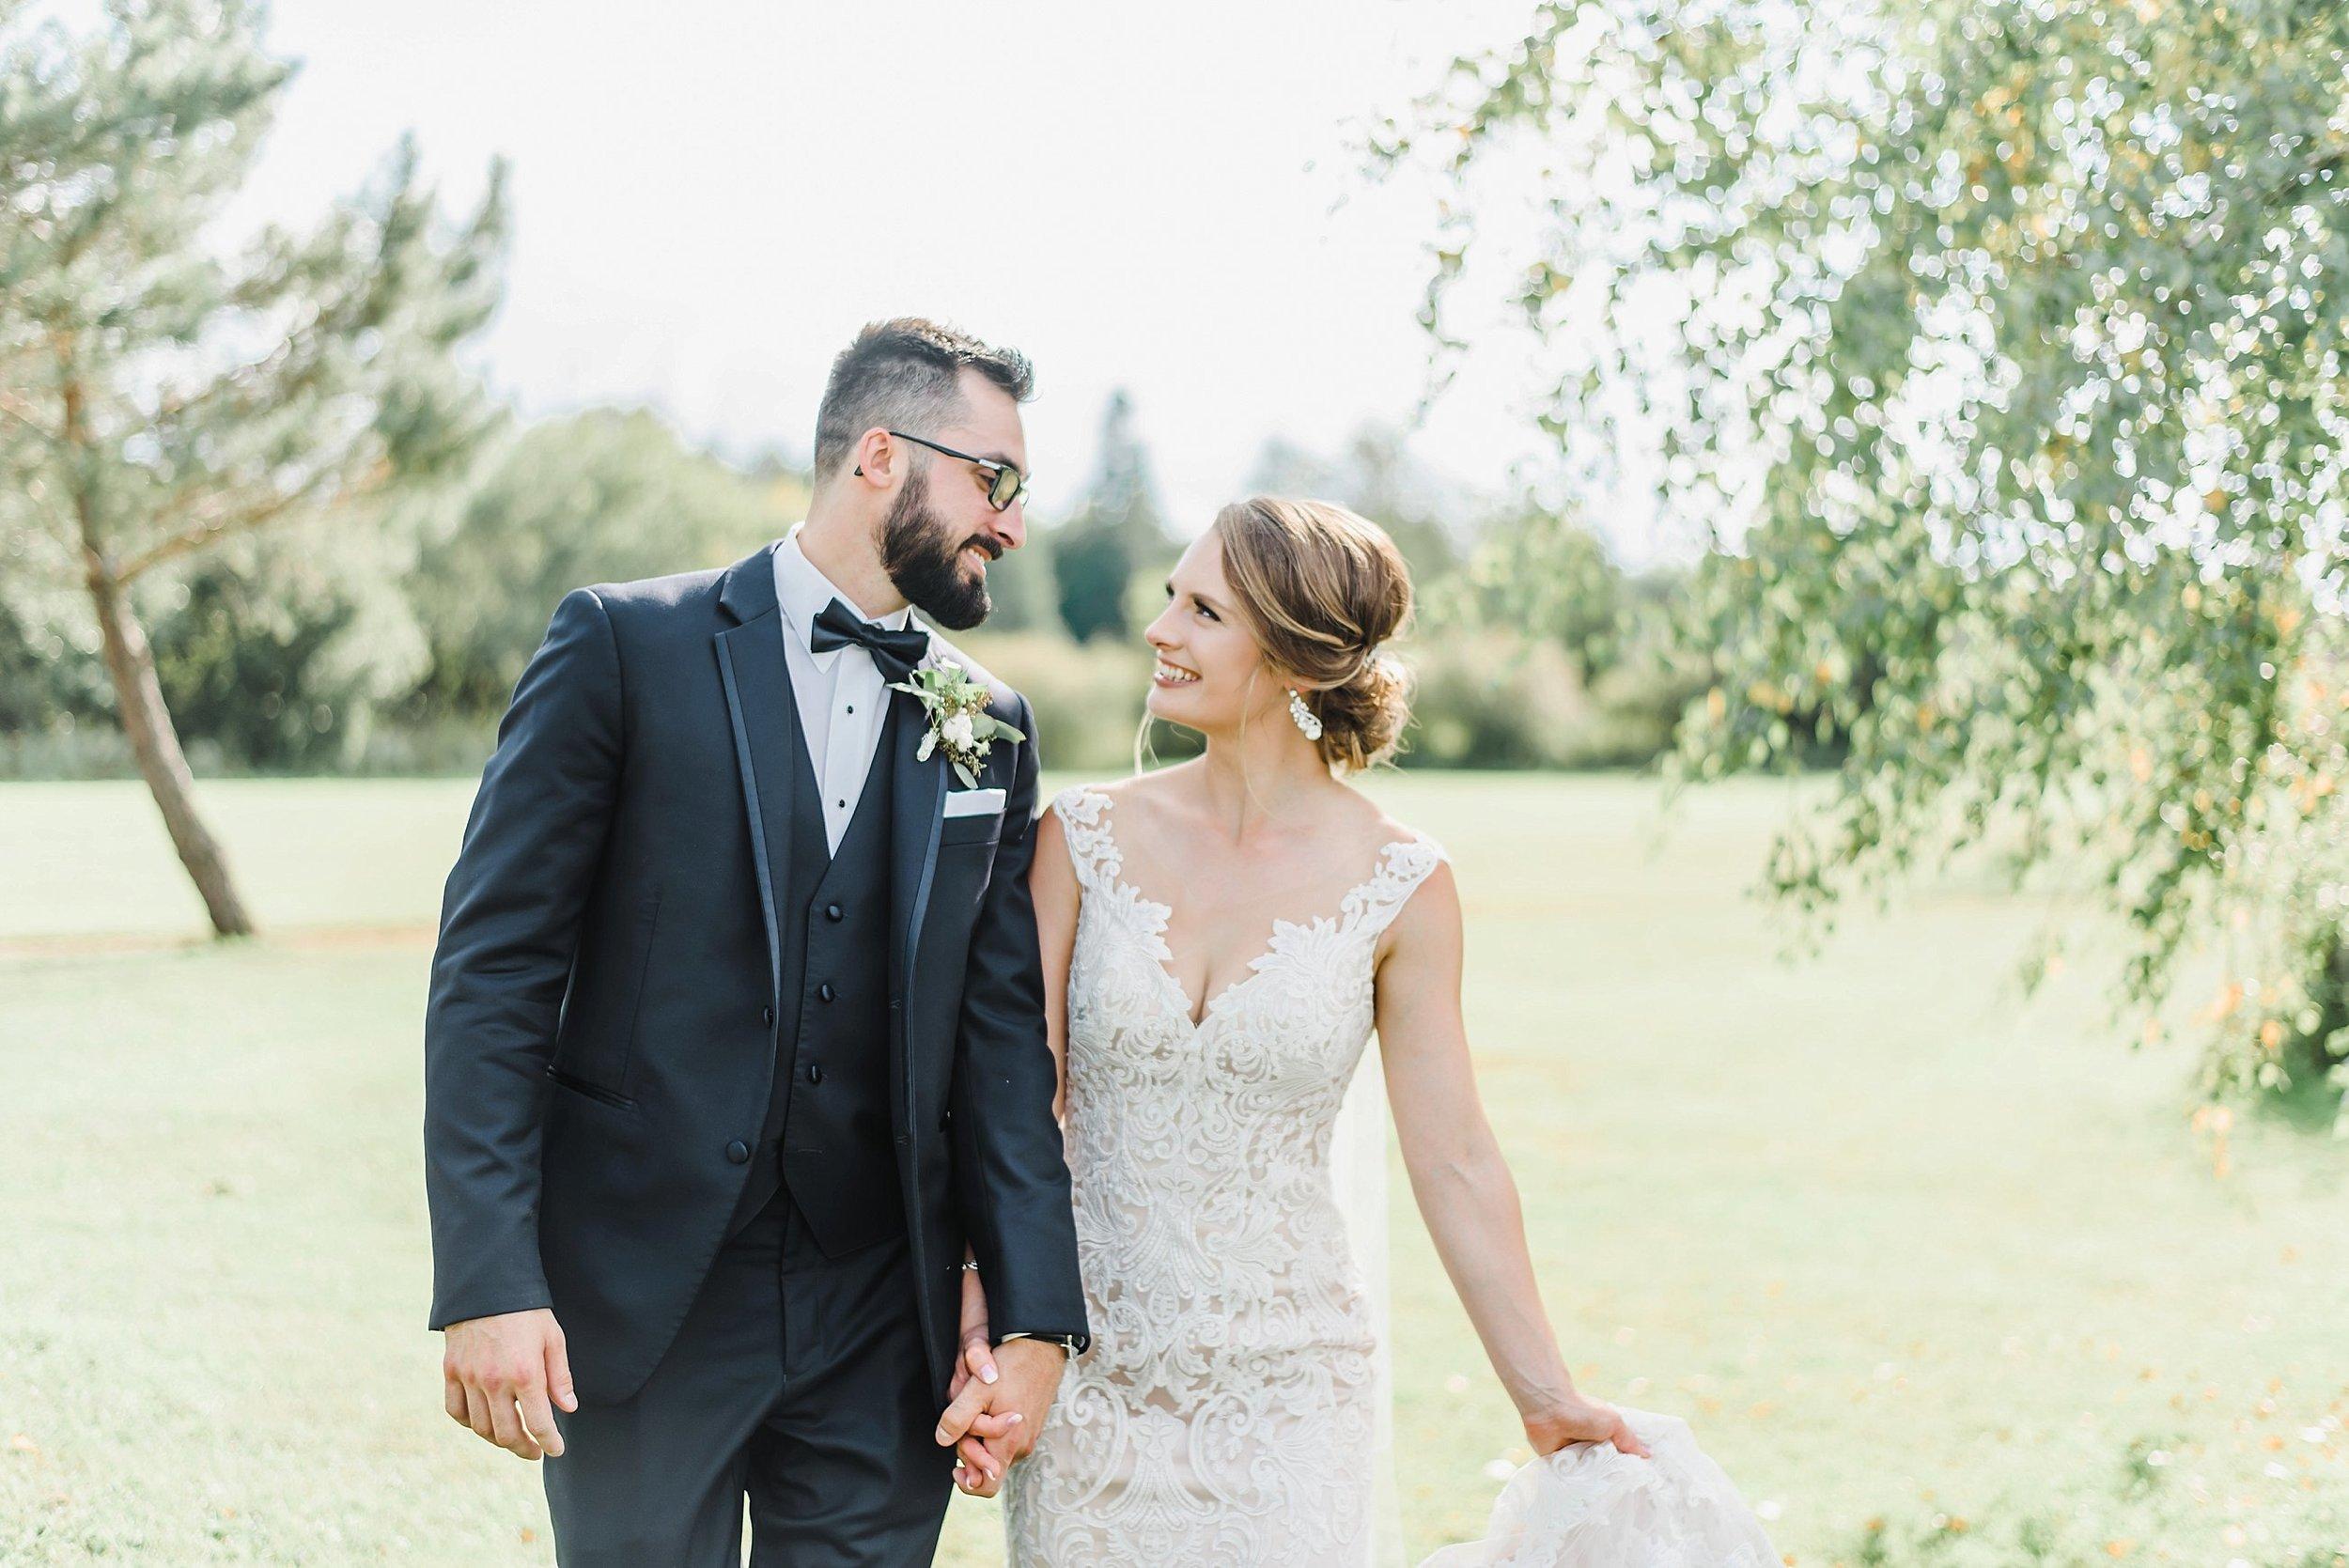 light airy indie fine art ottawa wedding photographer | Ali and Batoul Photography_1308.jpg